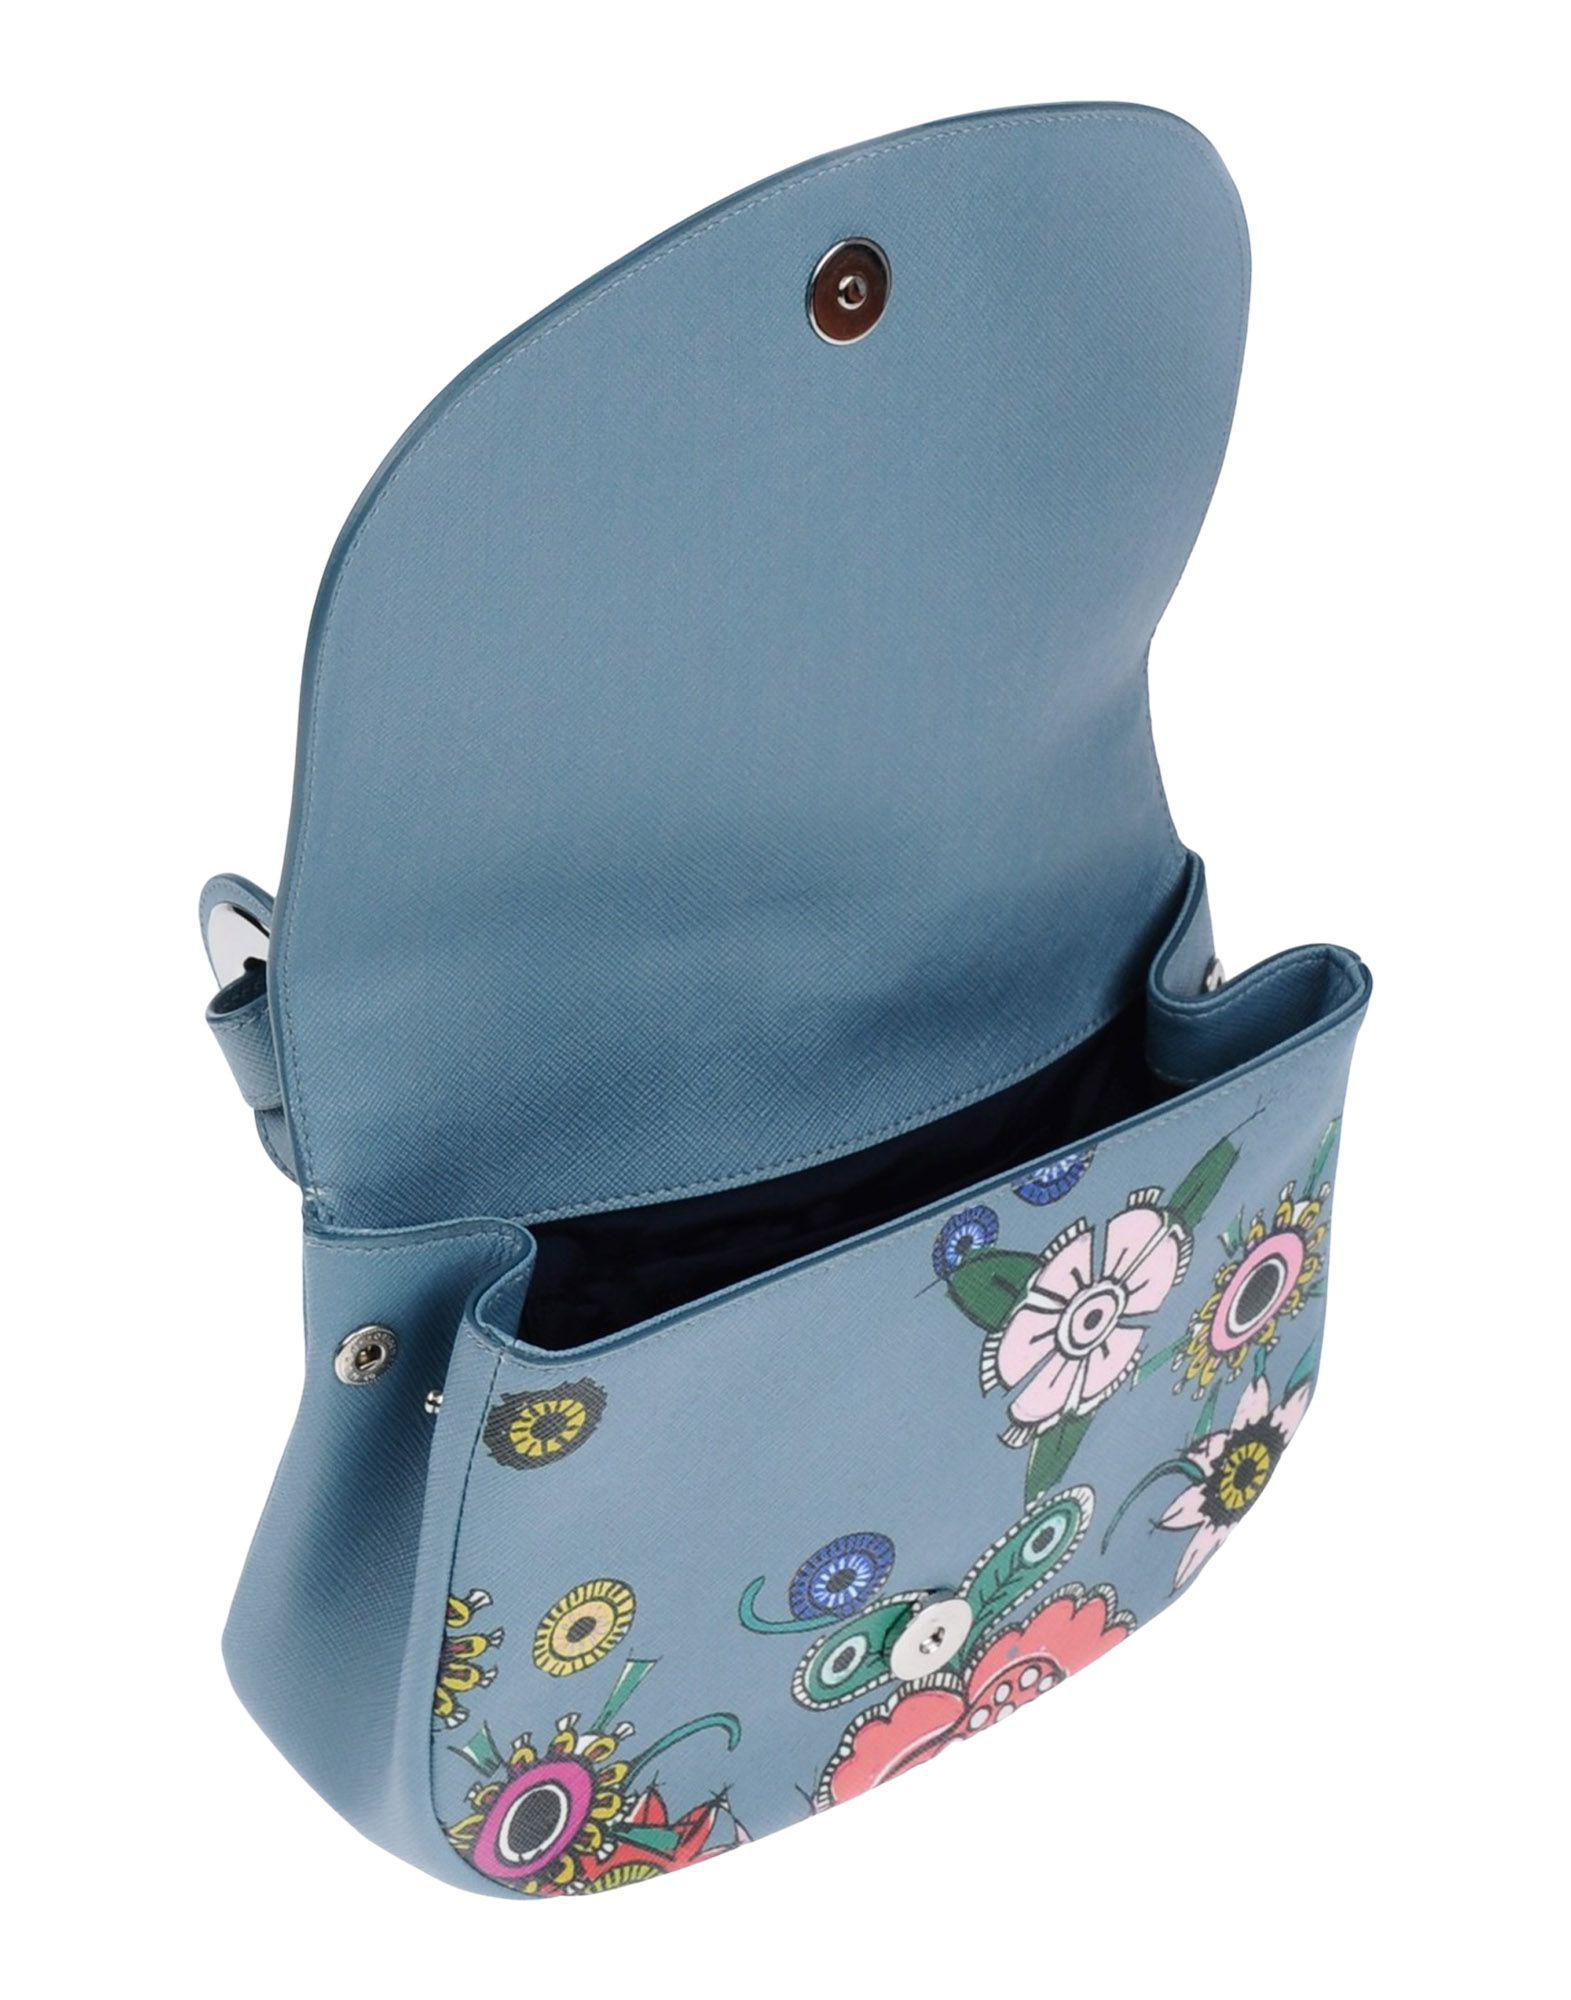 Jil Sander Navy Cross-body Bag in Slate Blue (Blue)